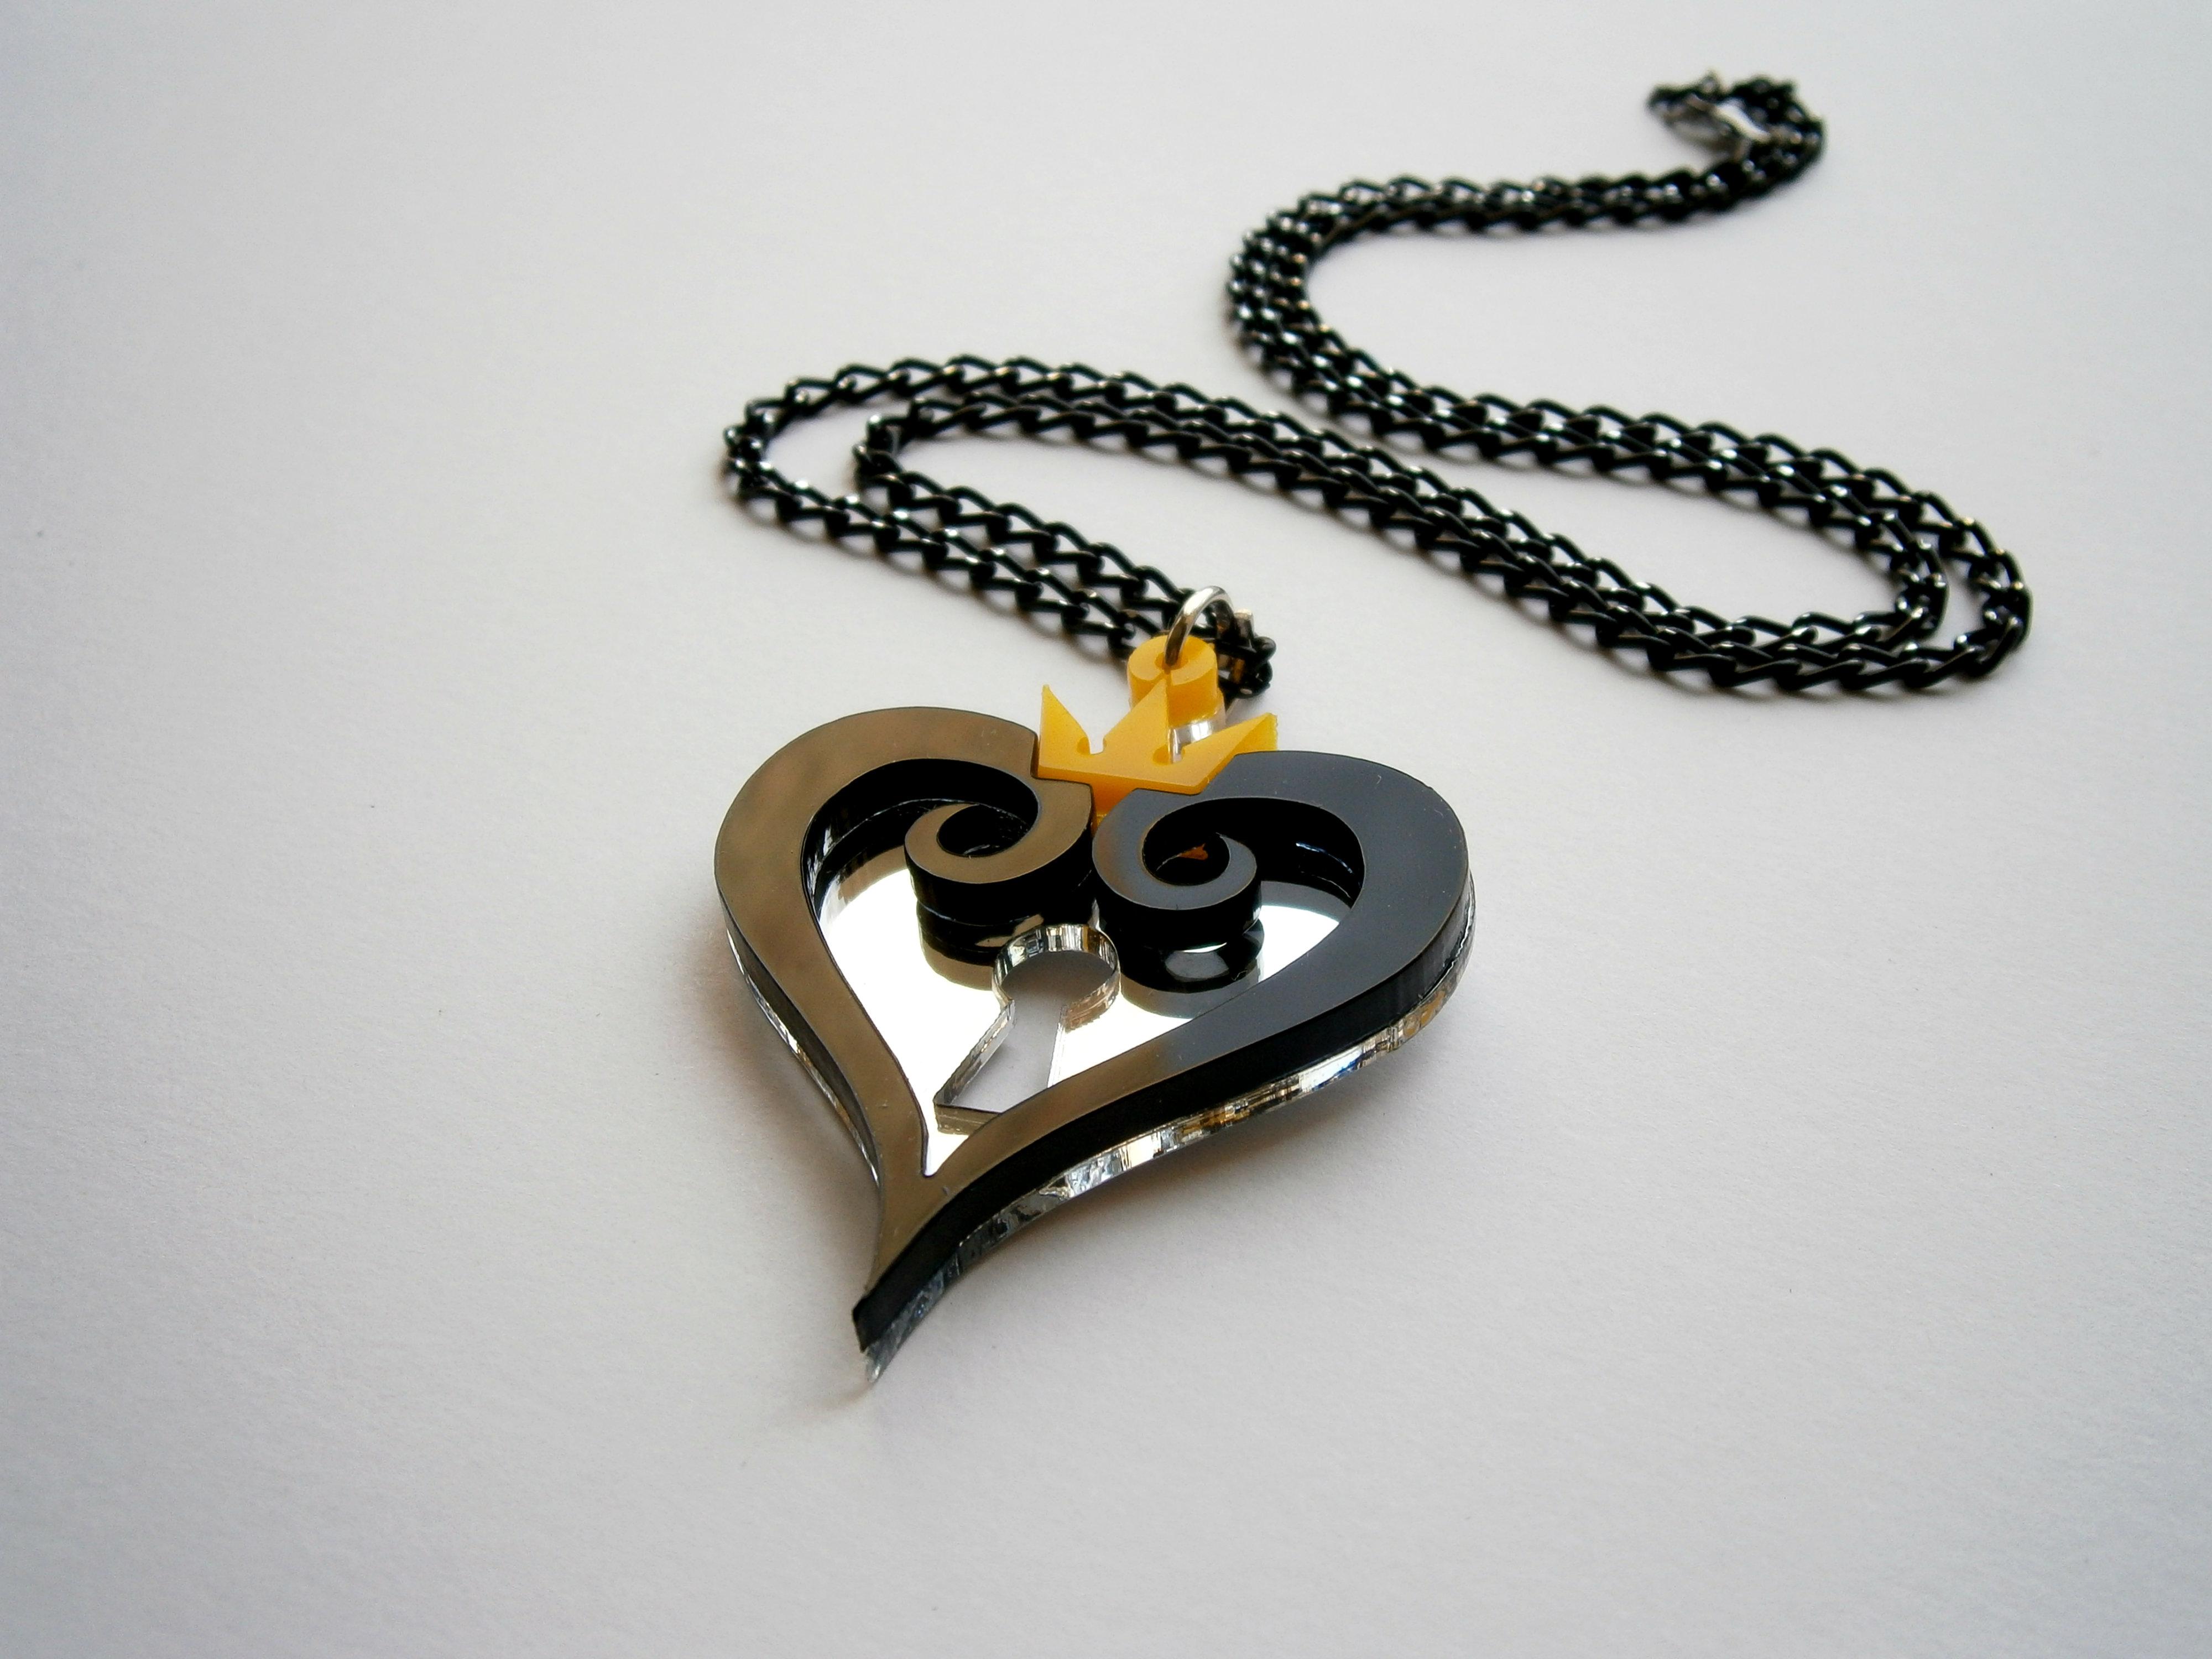 kingdom hearts necklace black hearts emblem pendant